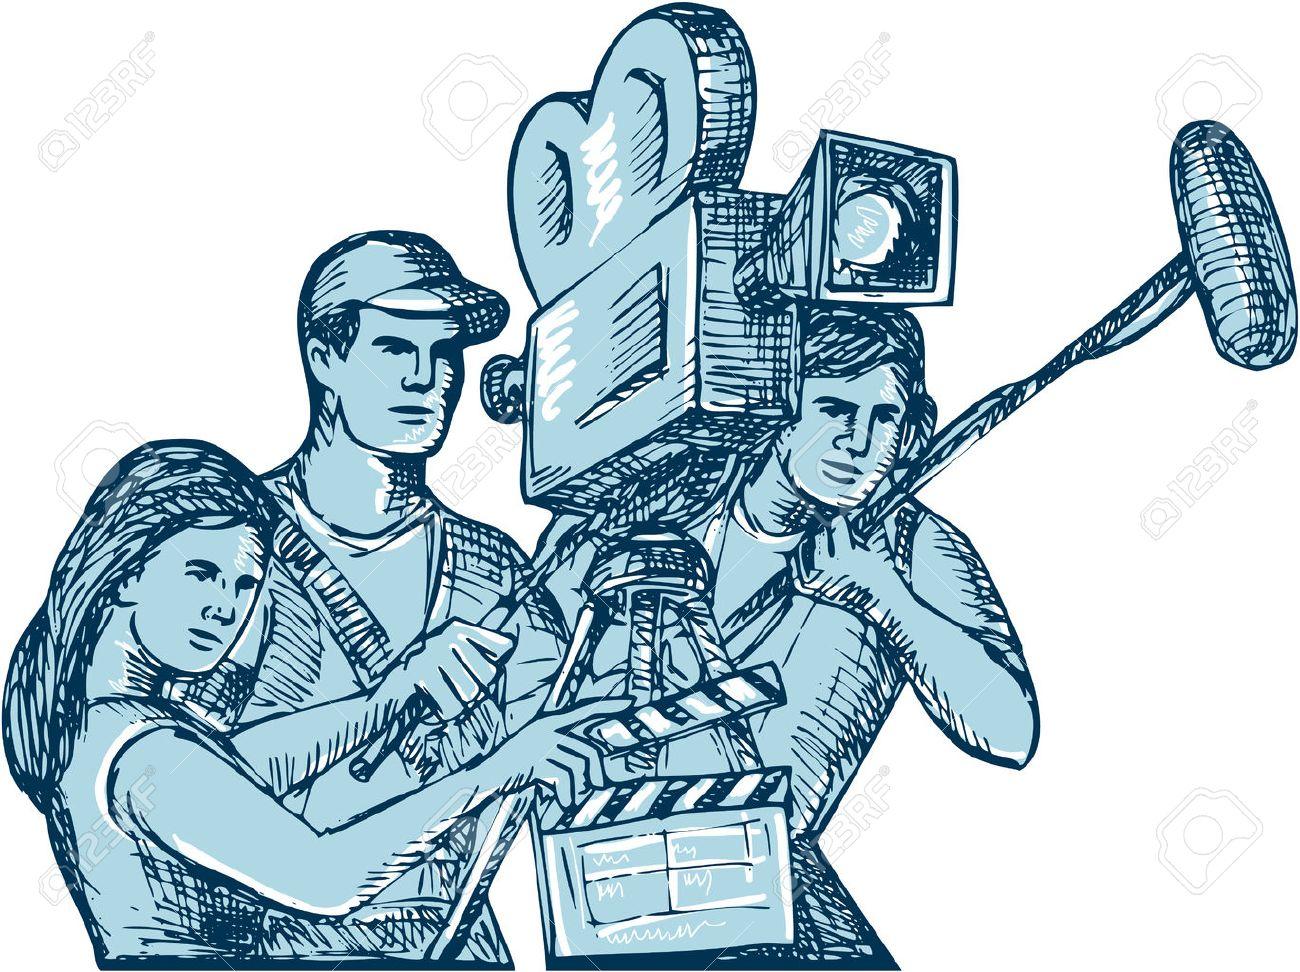 1300x972 Drawing Style Illustration Of A Film Crew Cameraman Soundman